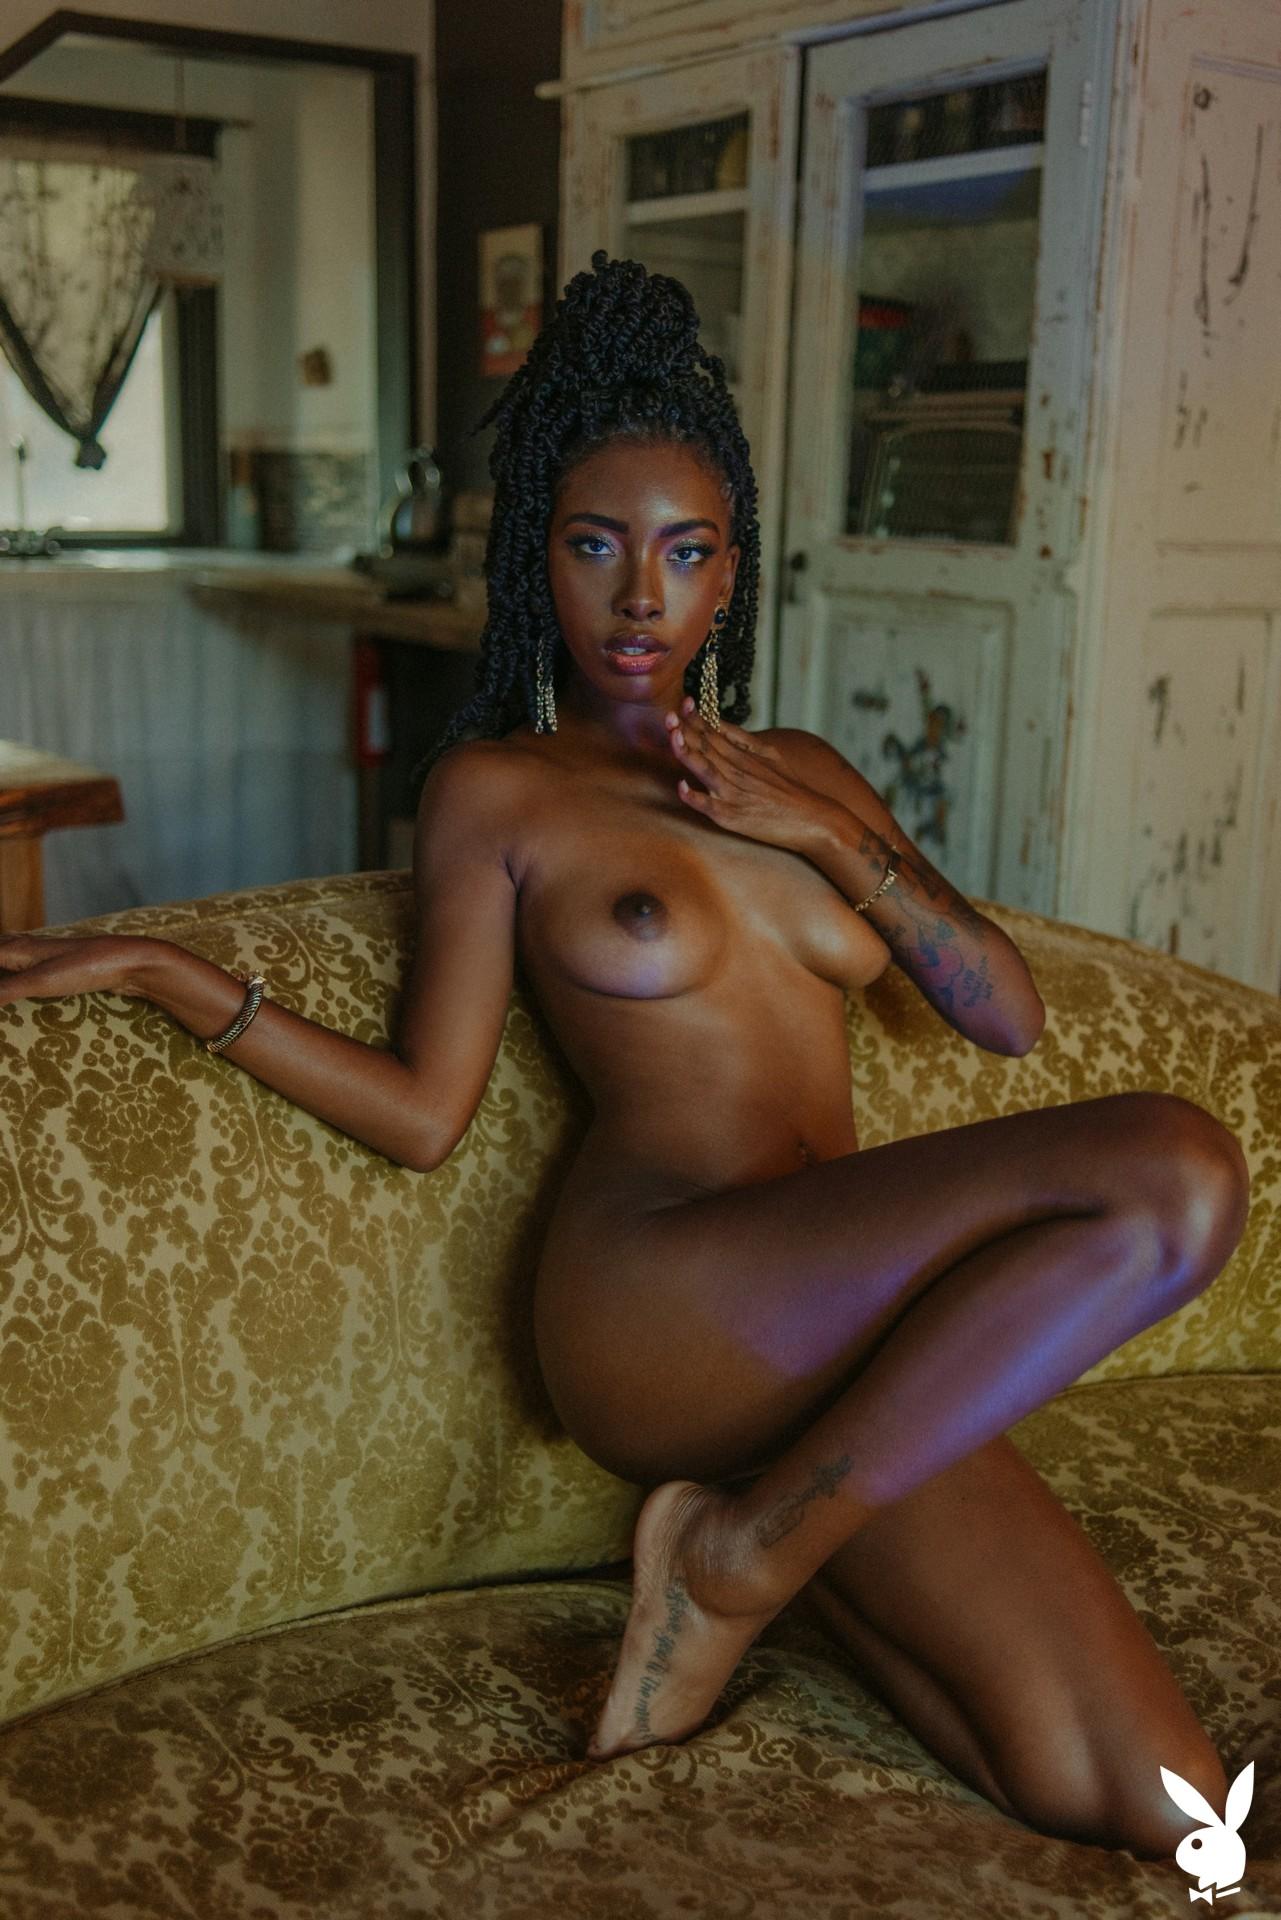 Sarissle In Little Luxuries Playboy Plus (33)